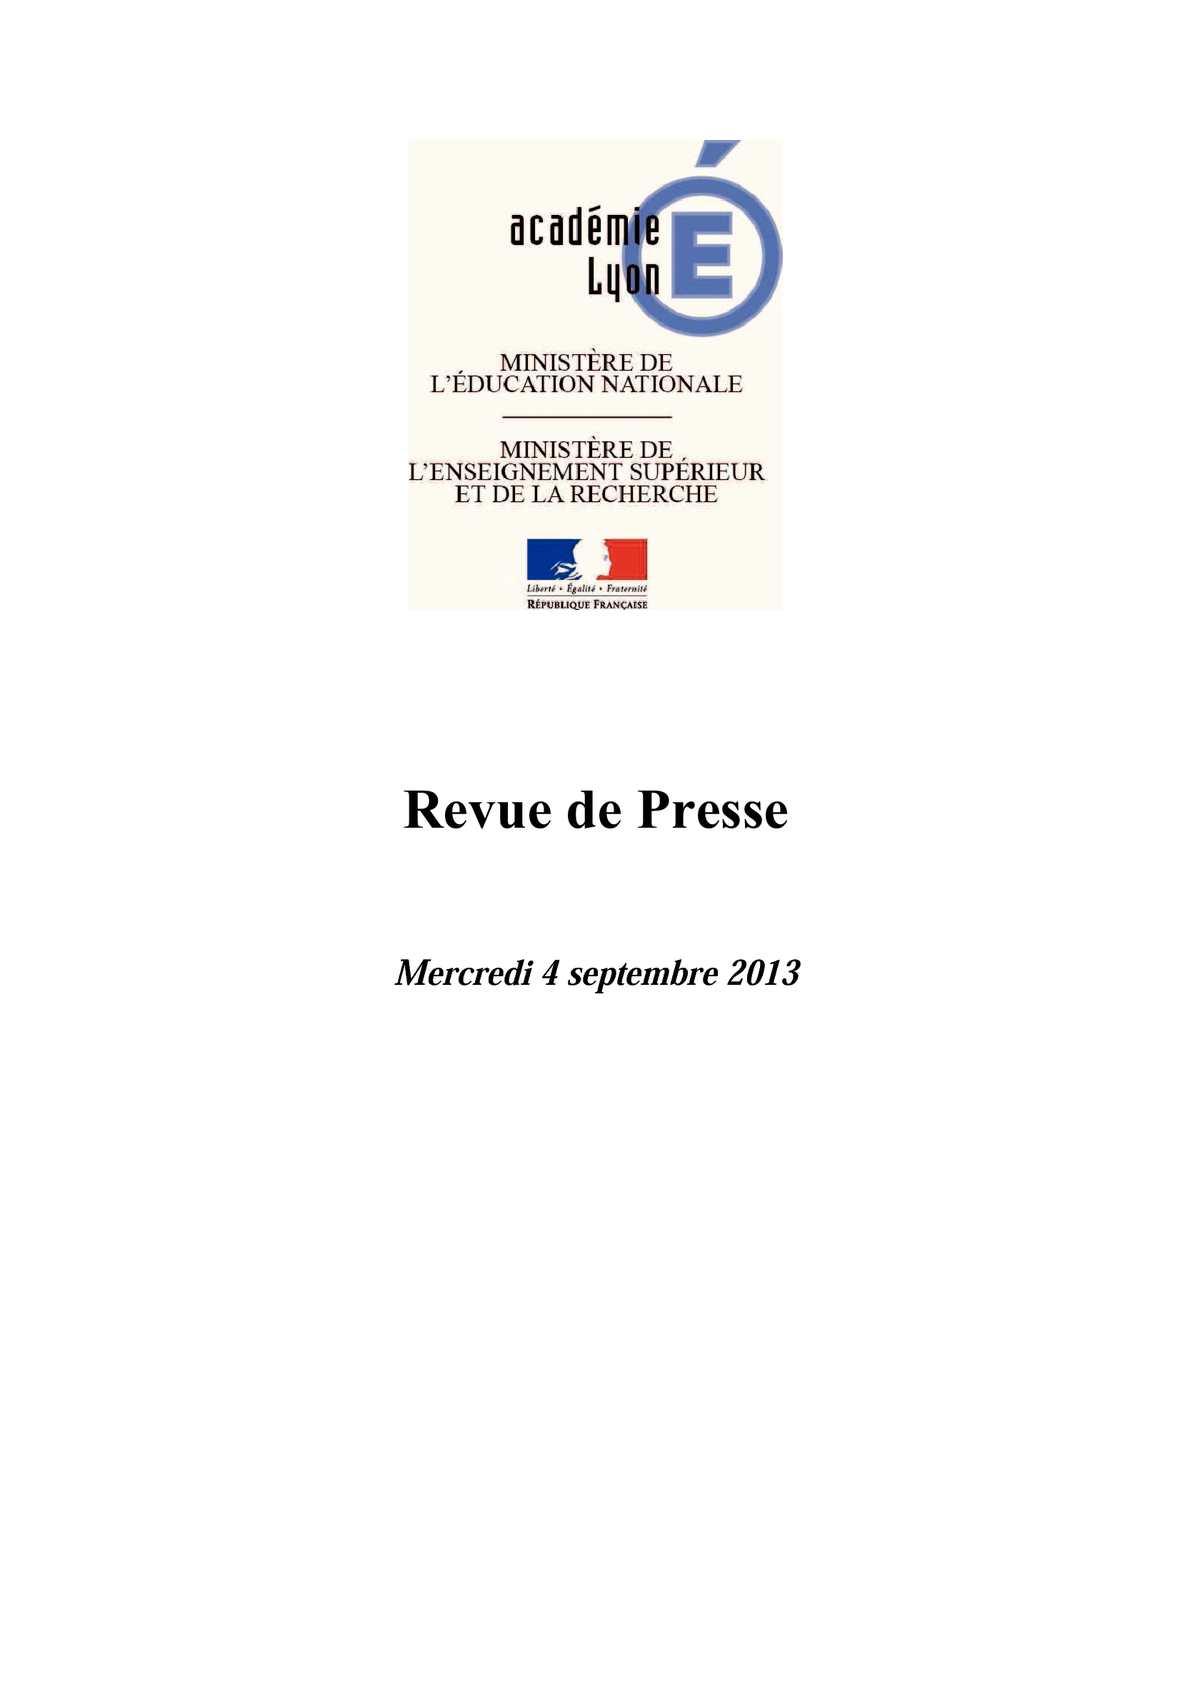 Calaméo Revue de presse du mercredi 4 septembre 2013